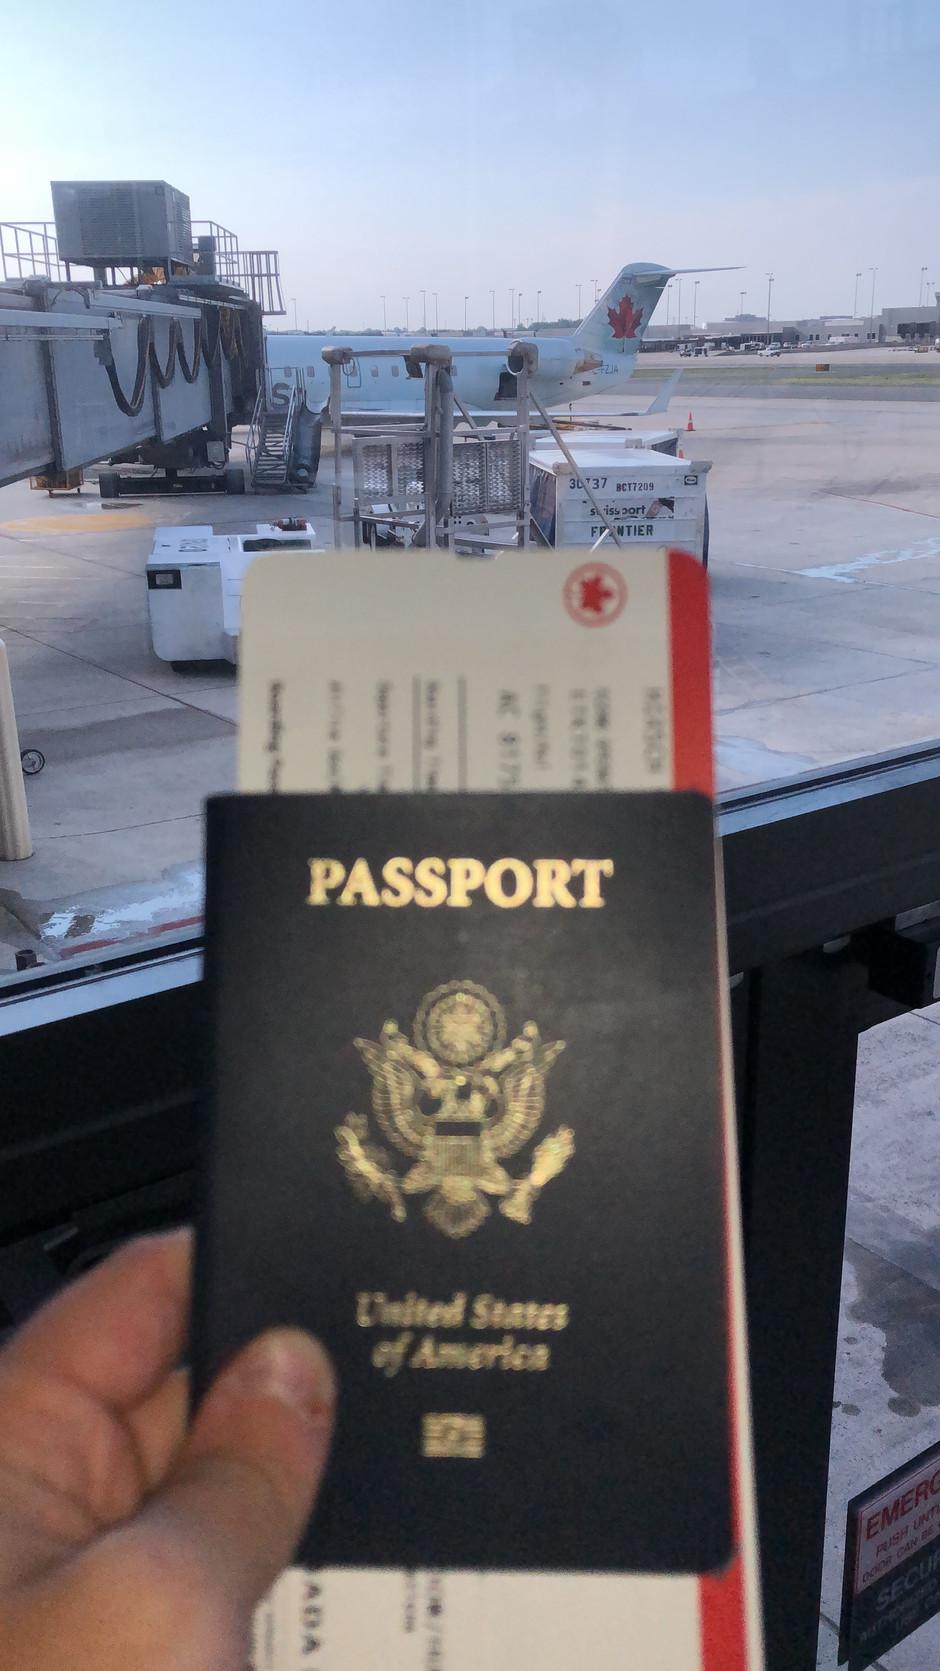 Washington D.C. to Incheon; A Wonderful Flying Experience